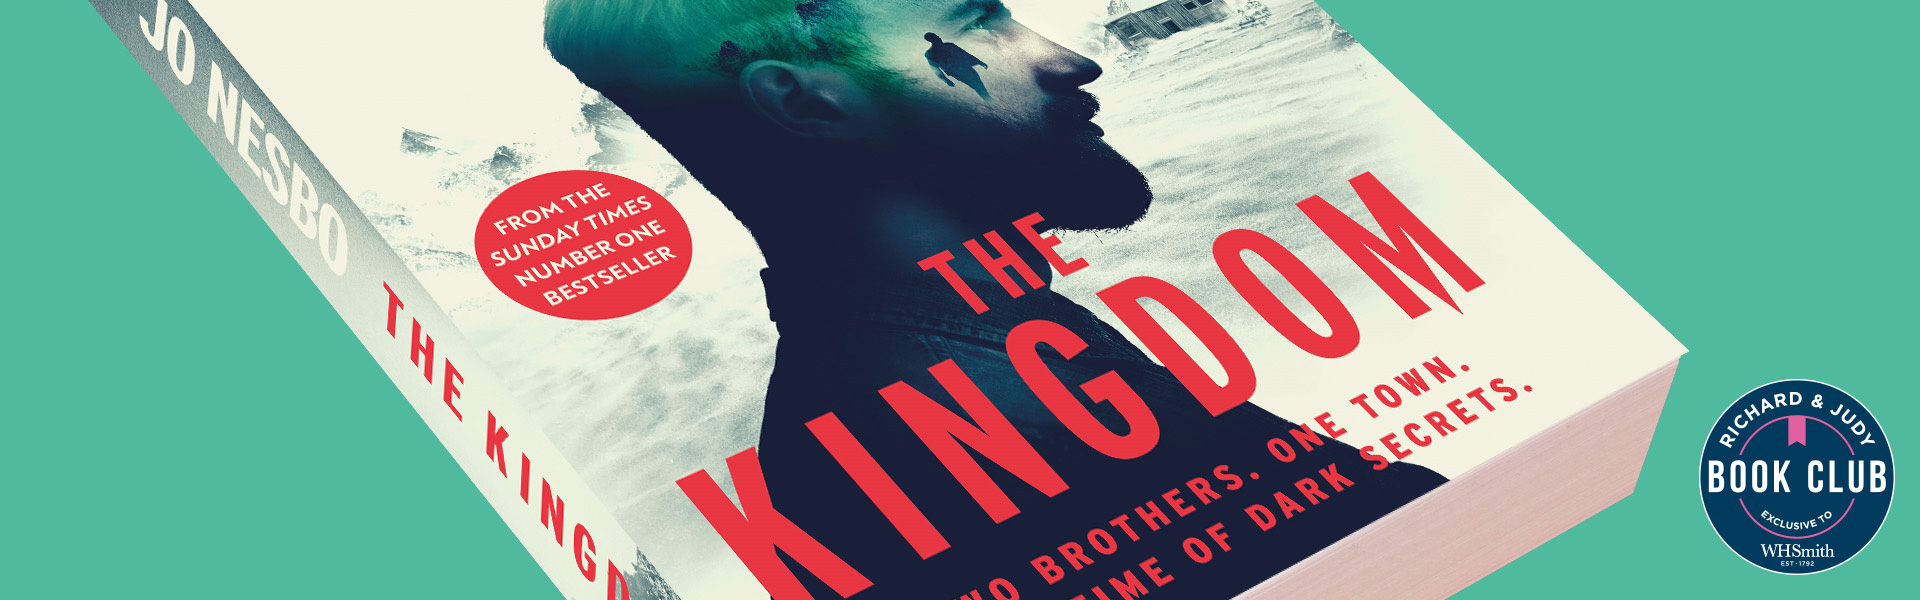 Richard & Judy Introduce The Kingdom by Jo Nesbo